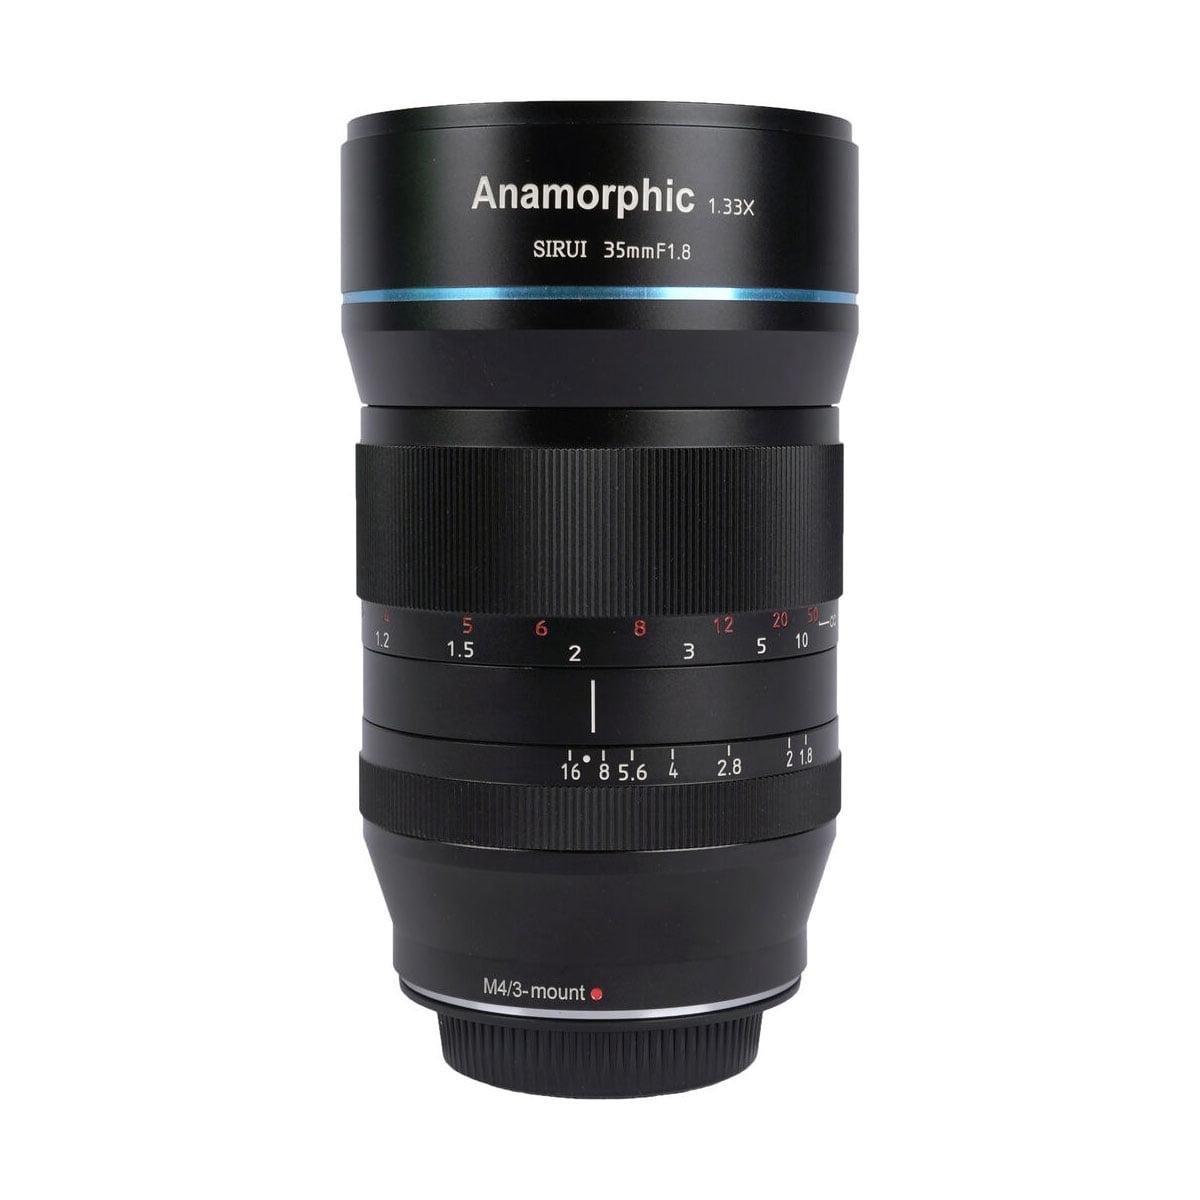 Sirui Anamorphic Lens 1.33x 35mm f/1.8 – MFT